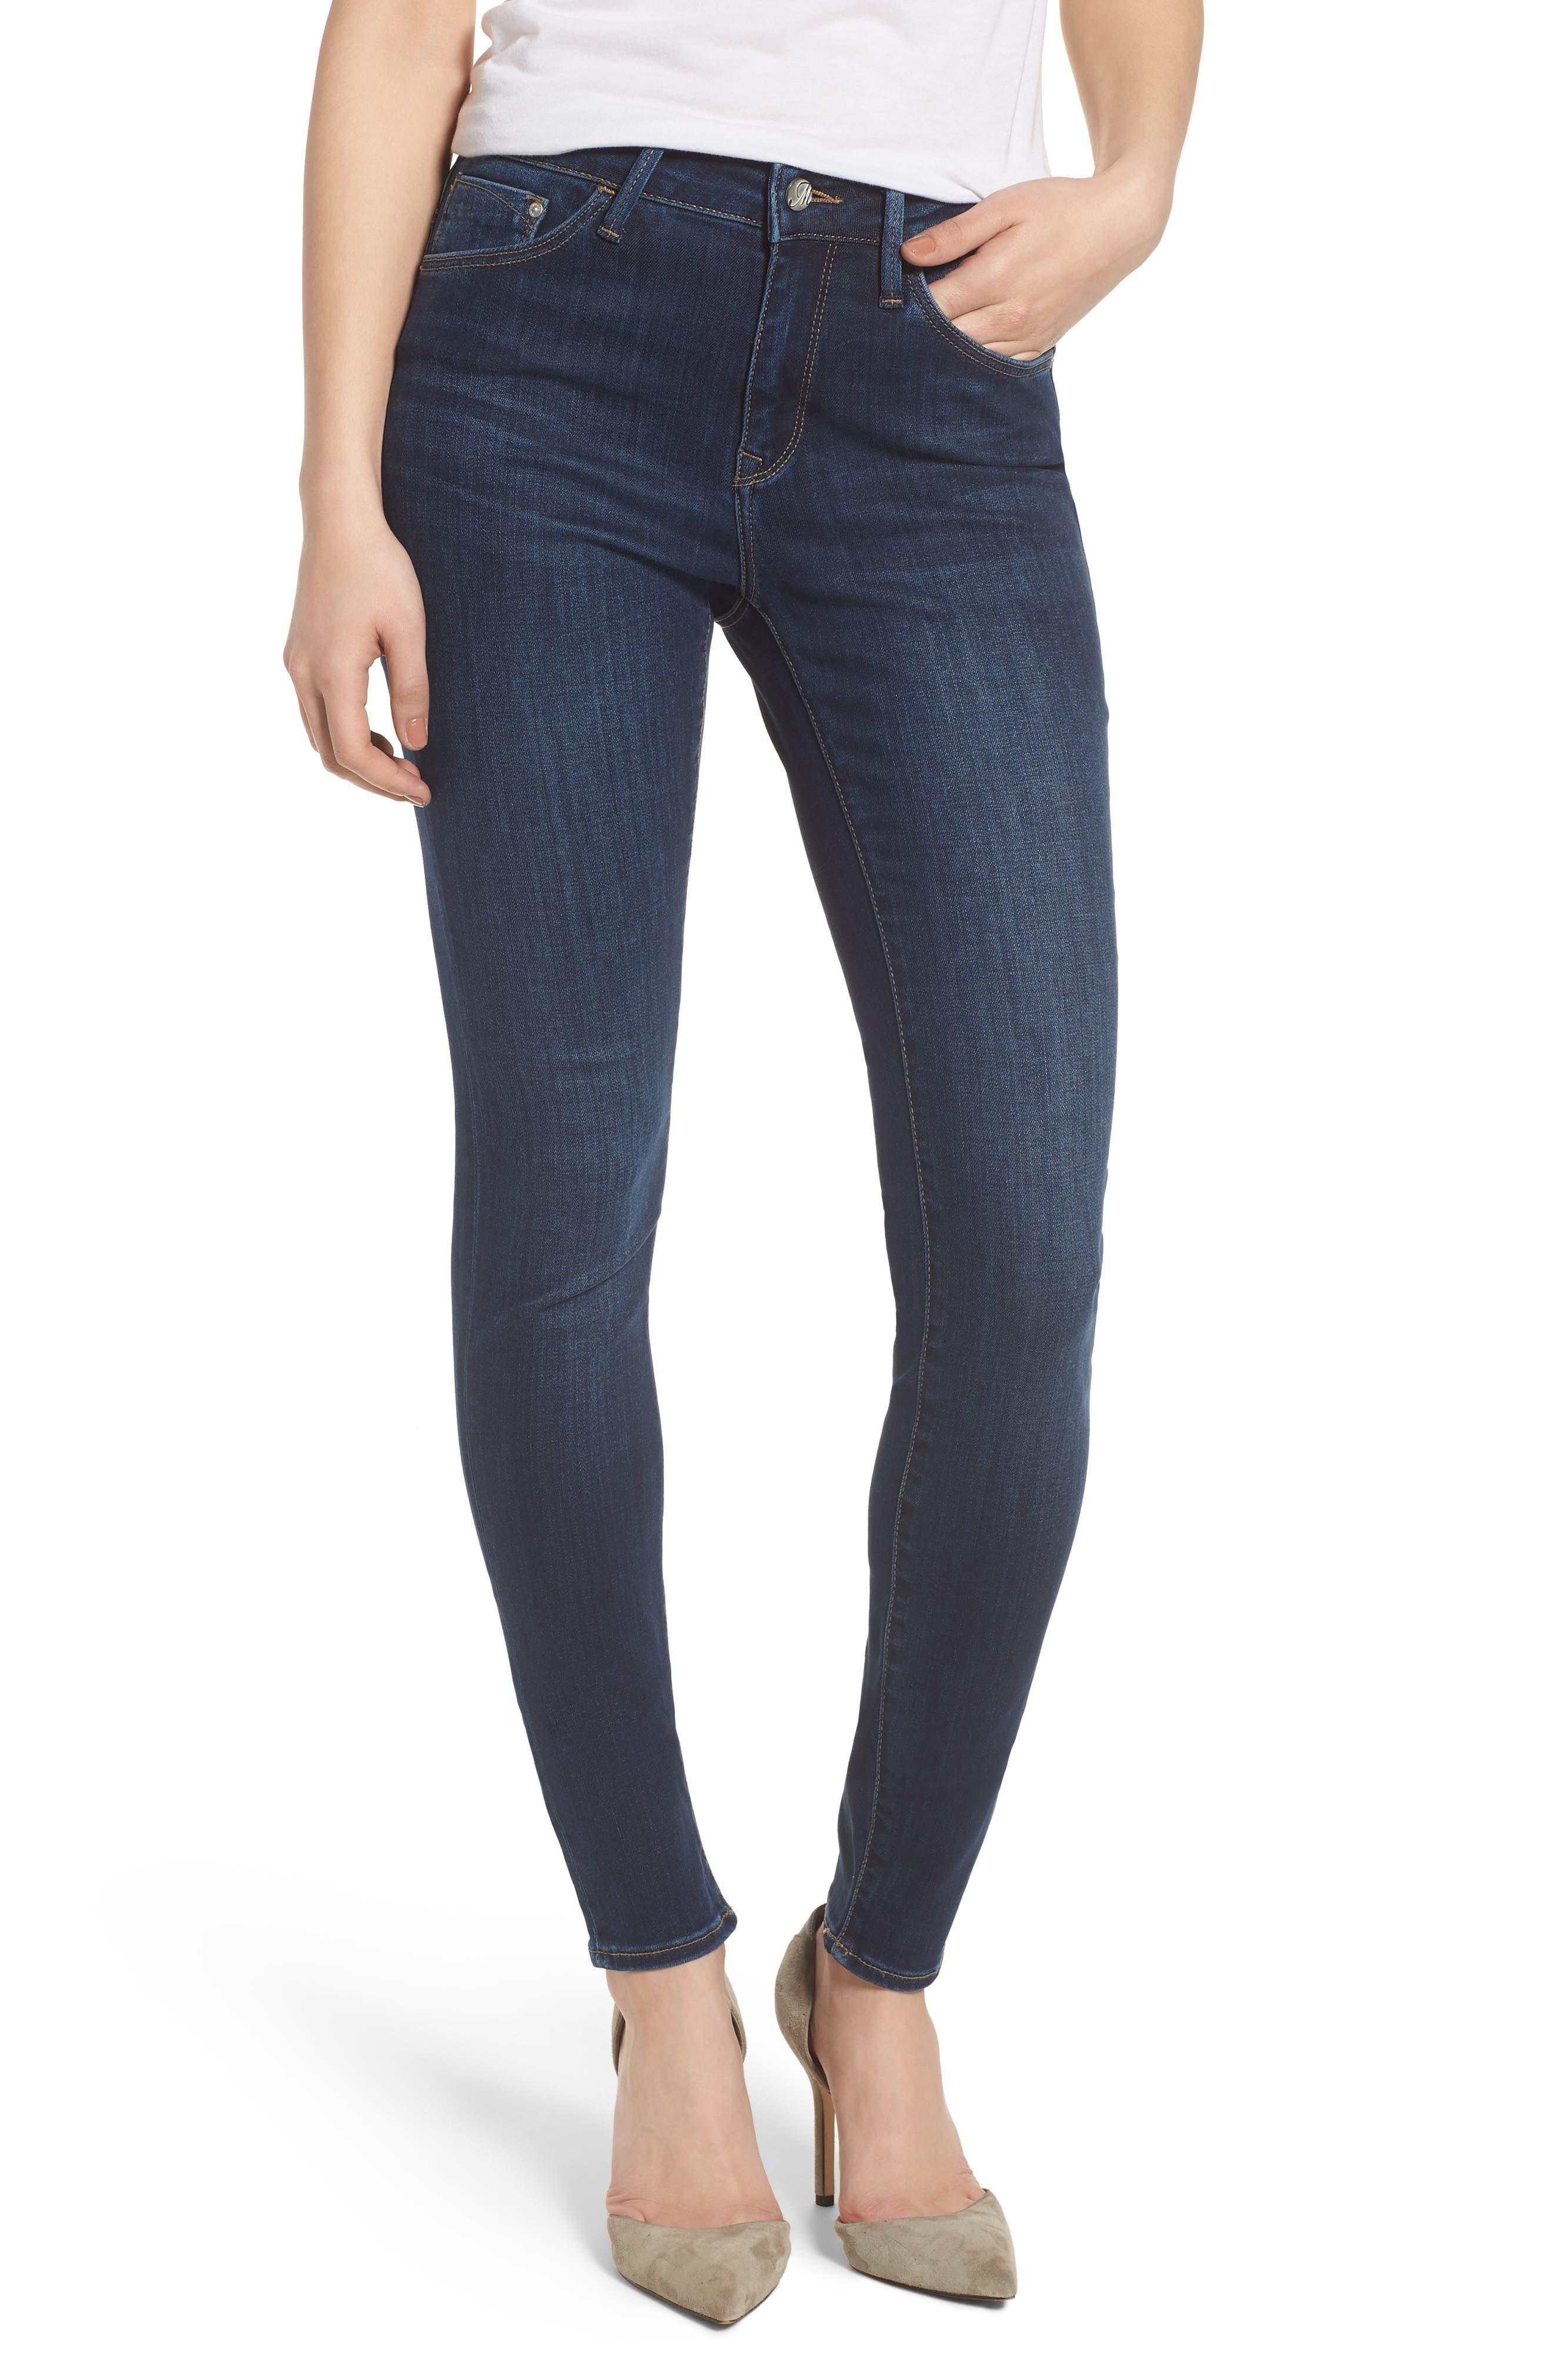 Alissa Skinny Jeans,                         Main,                         color, Dark Supersoft